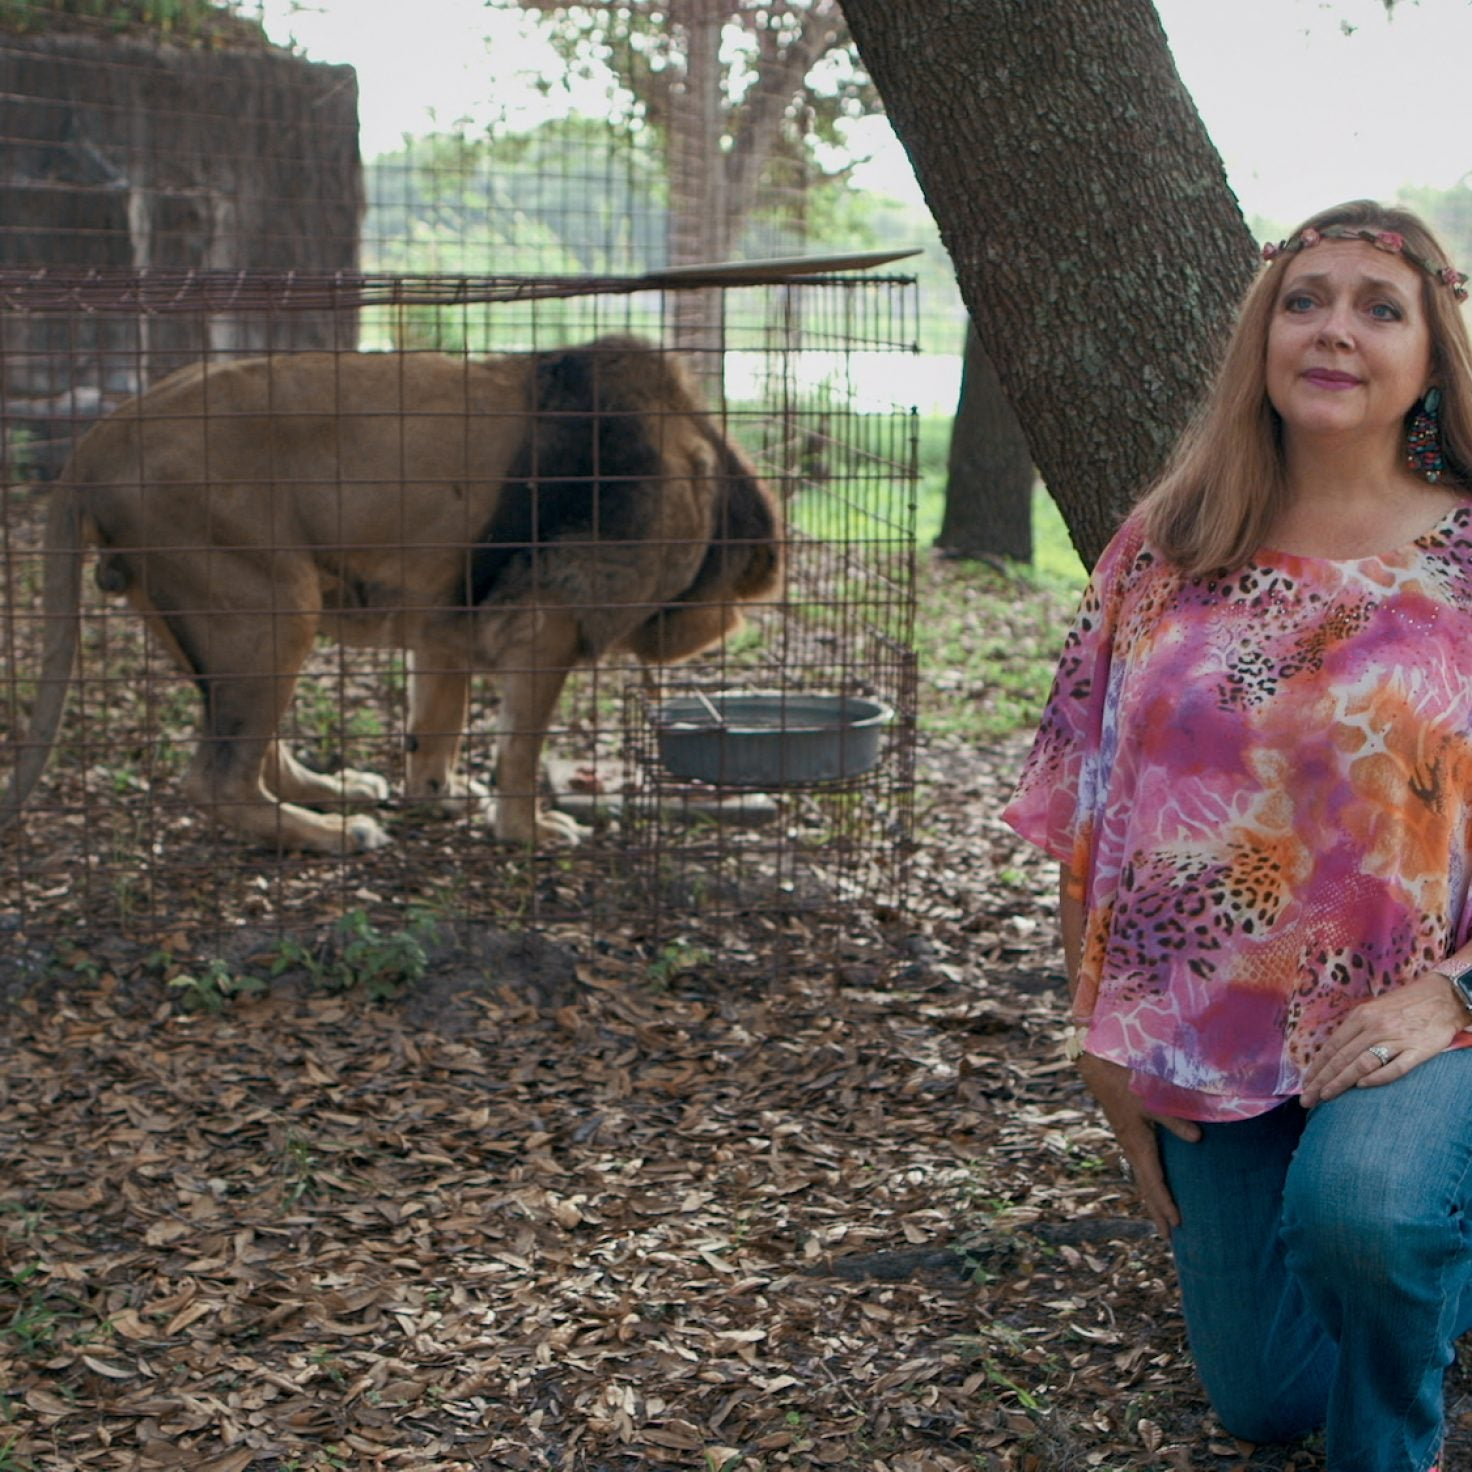 O.J. Simpson Thinks 'Tiger King's' Carole Baskin Murdered Her Husband